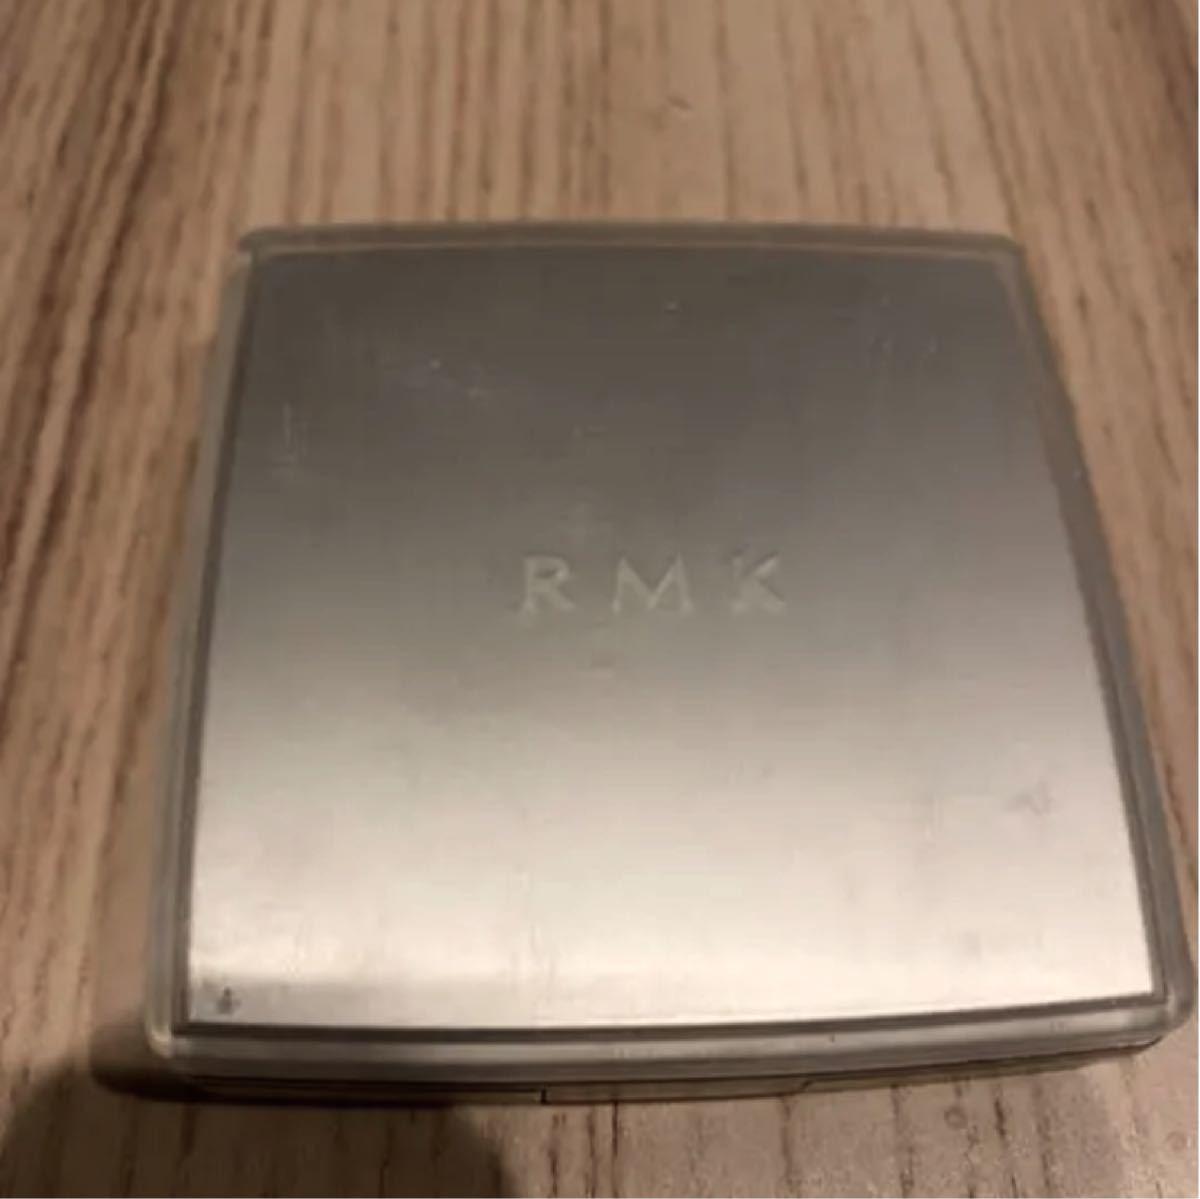 RMK アイシャドウ ブルー グリーン パープル ホワイト SUQQU デザイニングカラーアイズ ルナソルスキンモデリングアイズ